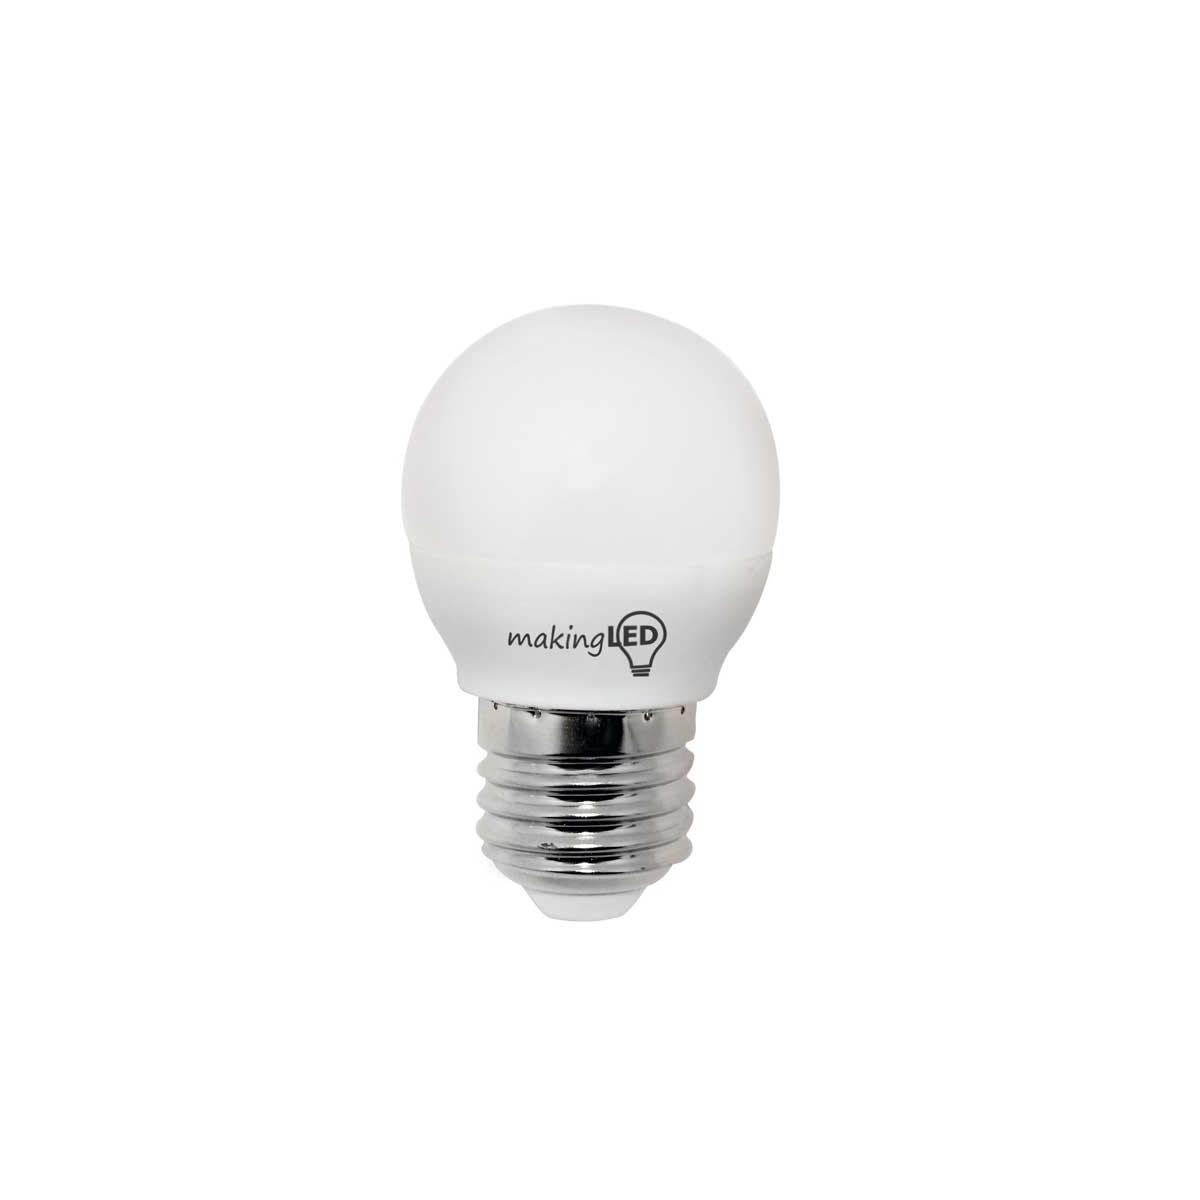 LED ESFERICA E27 4W 300LM 4200ºK